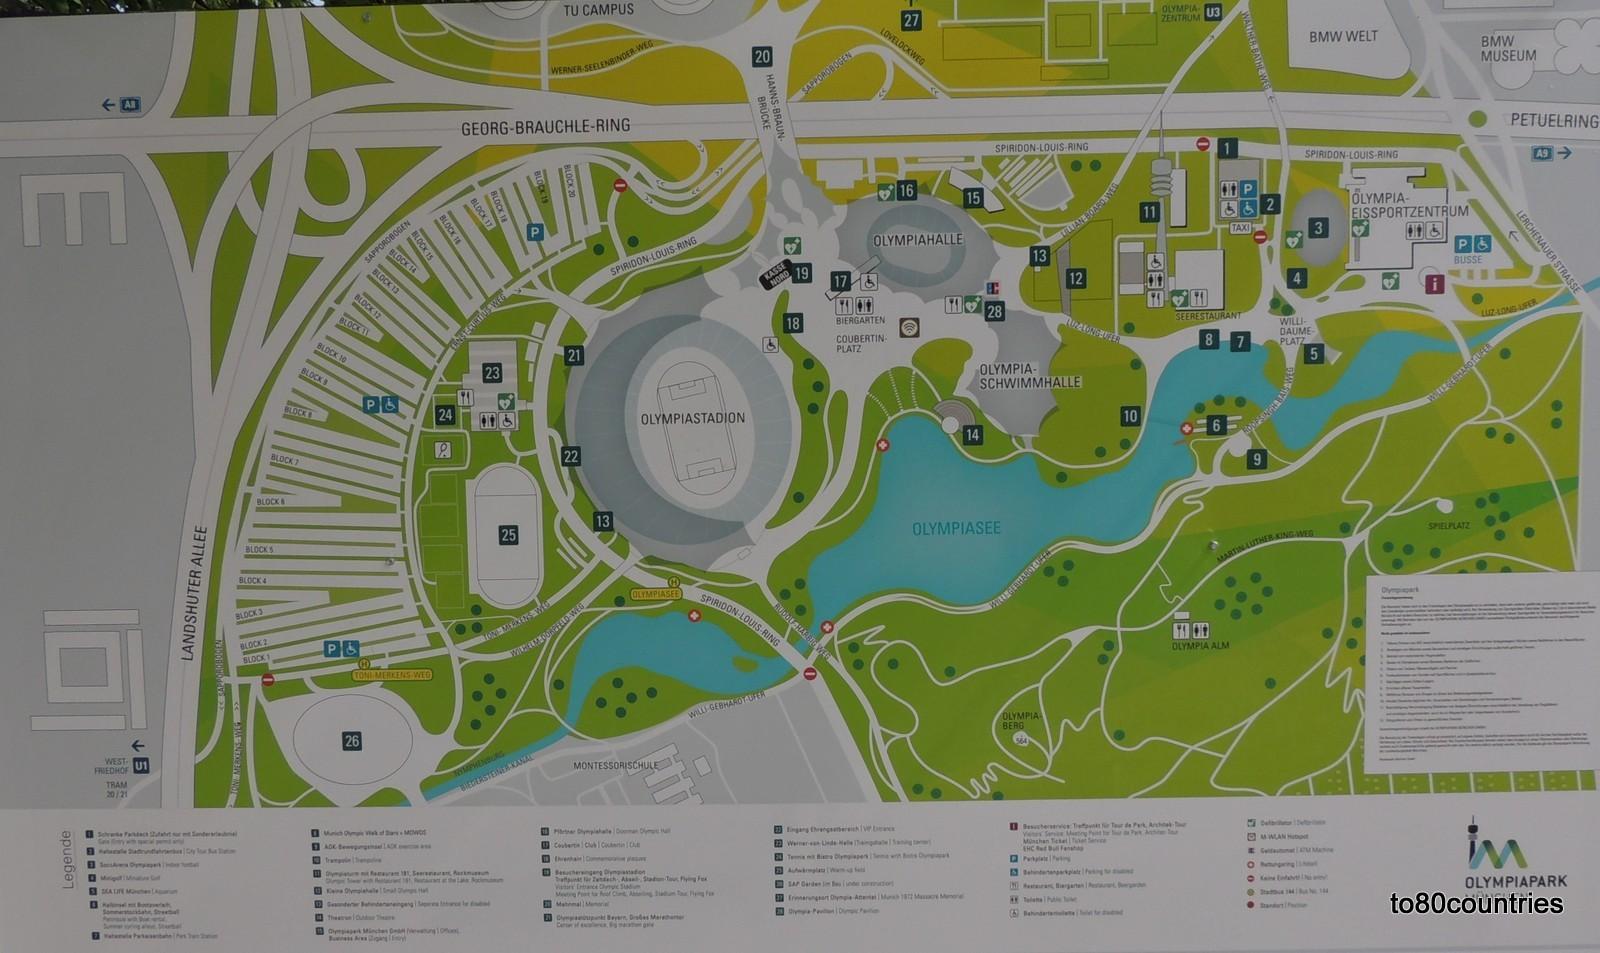 Plan Olympiapark München